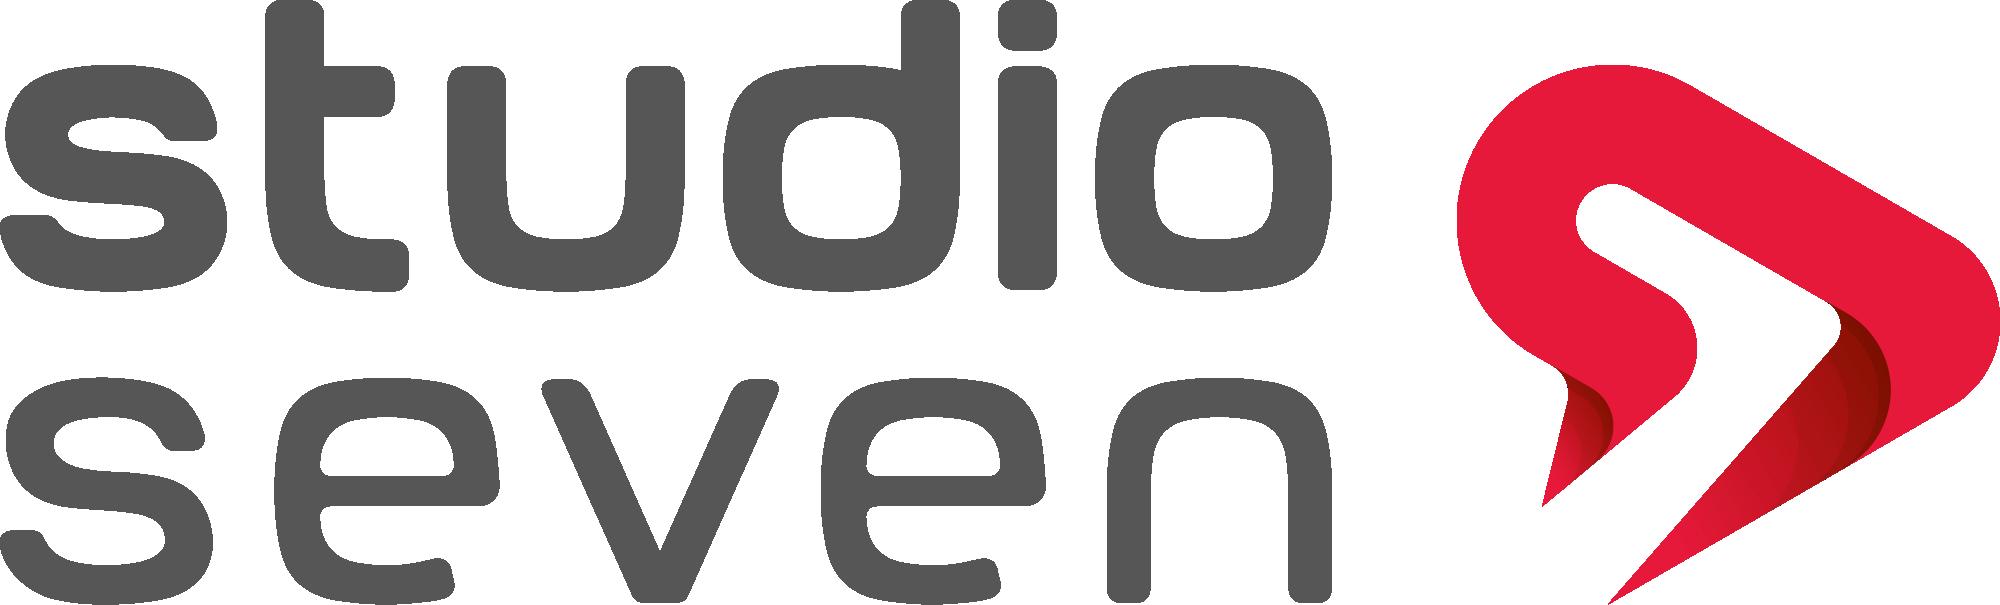 Studioseven-hz-logo